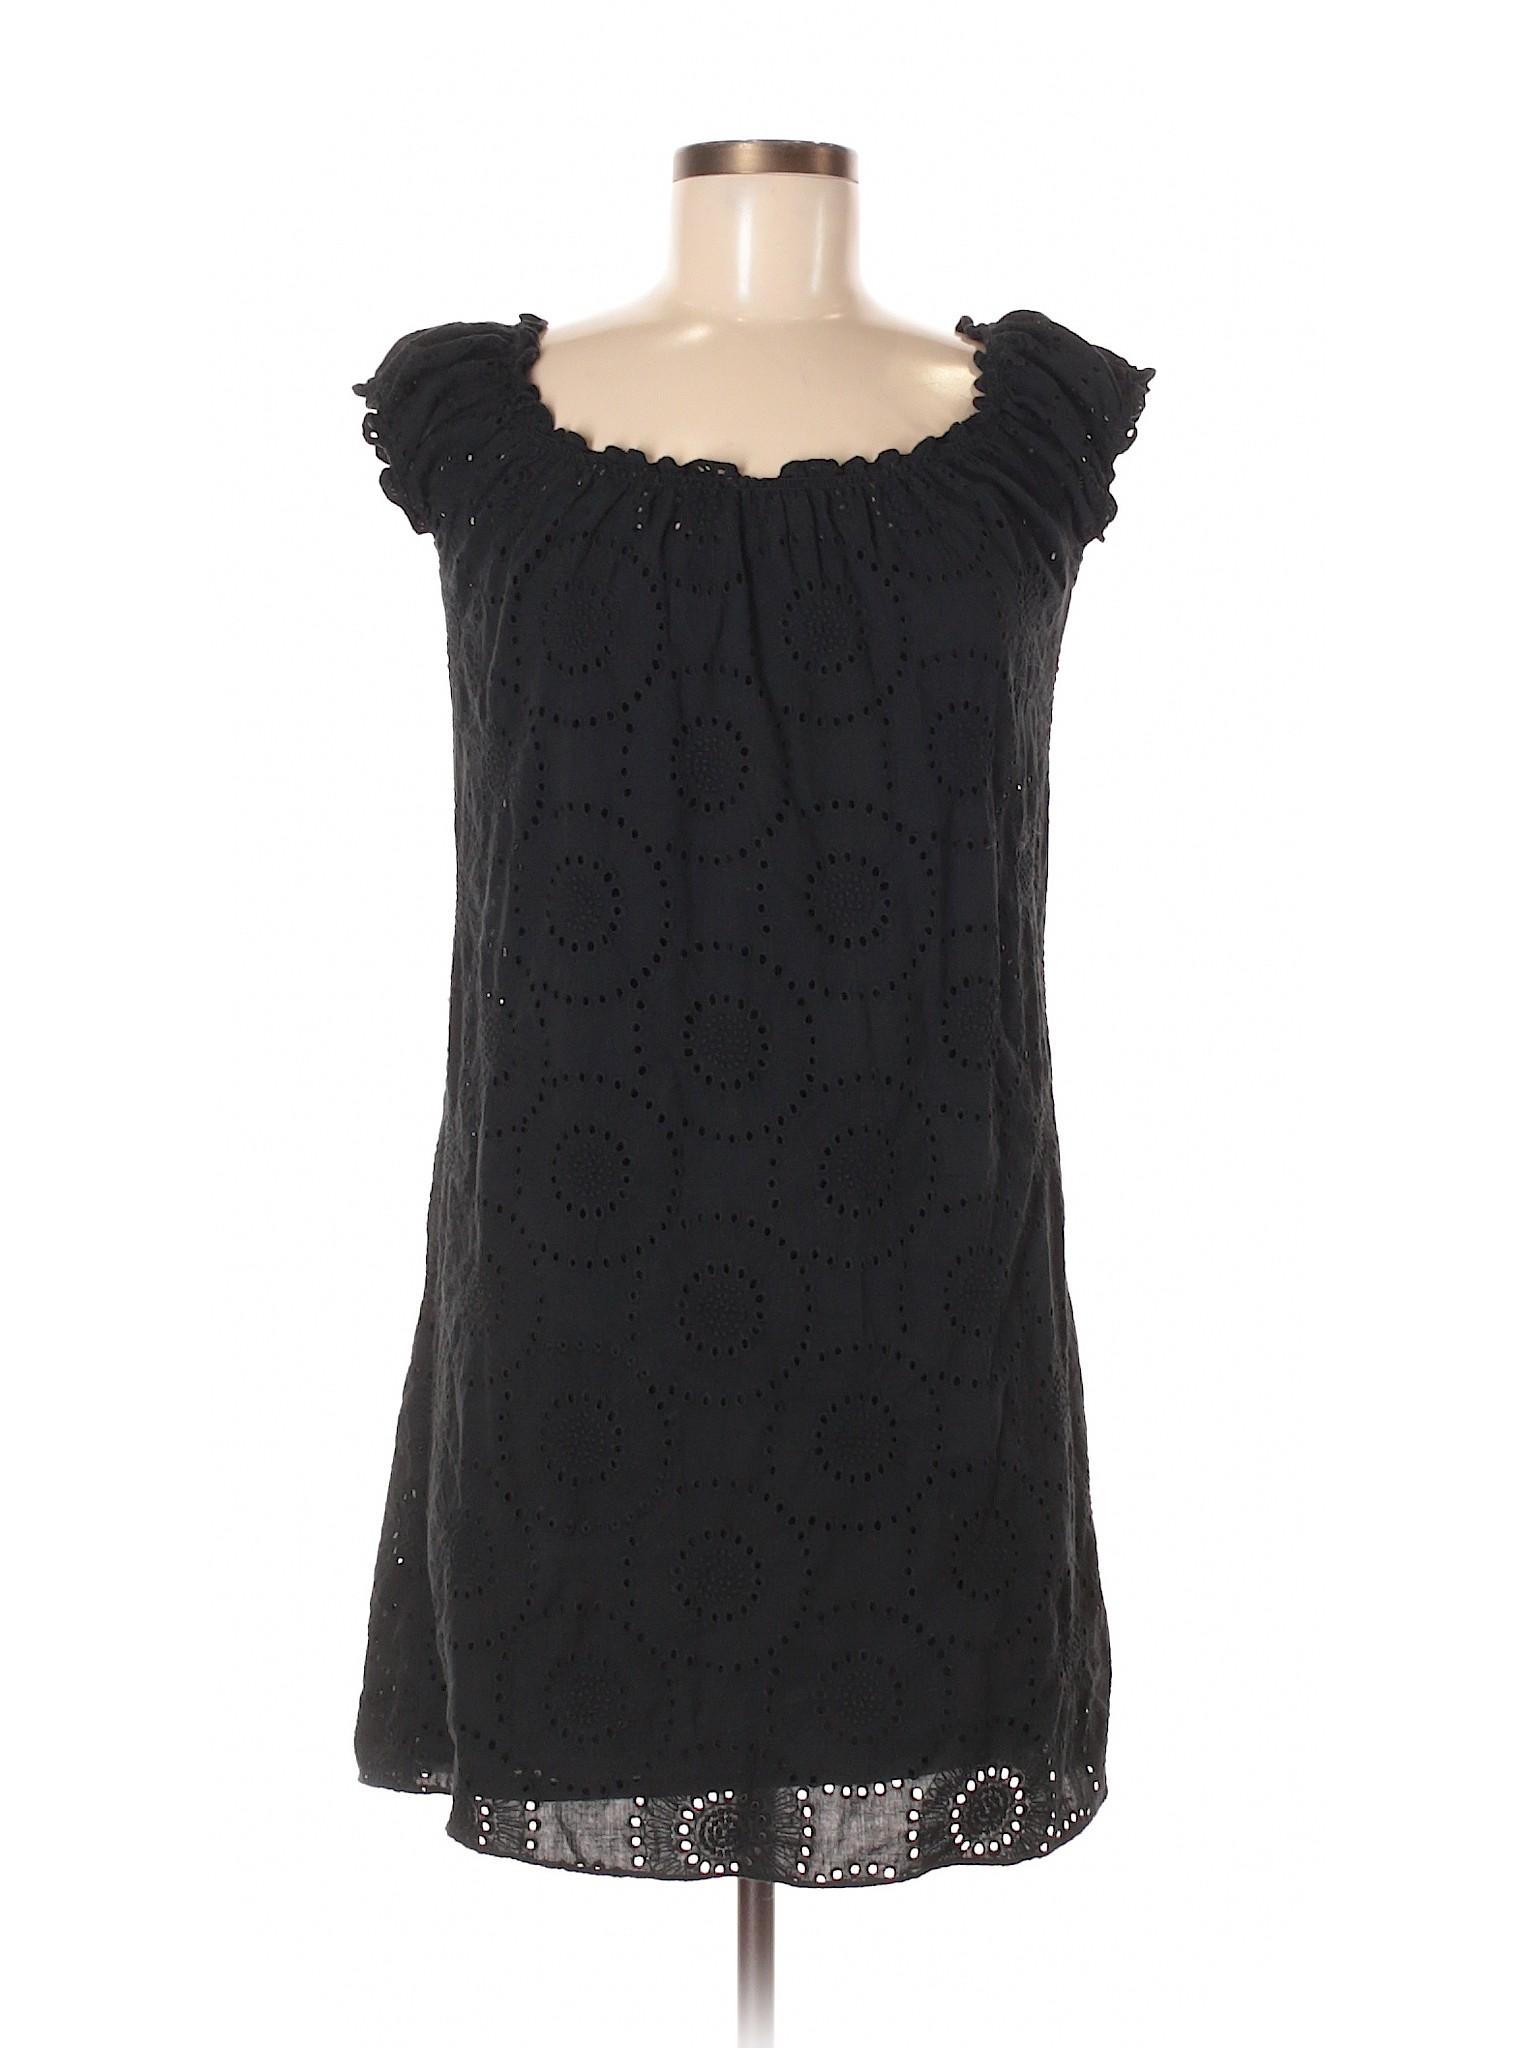 Dress Max Casual Boutique winter Studio aTFn7q